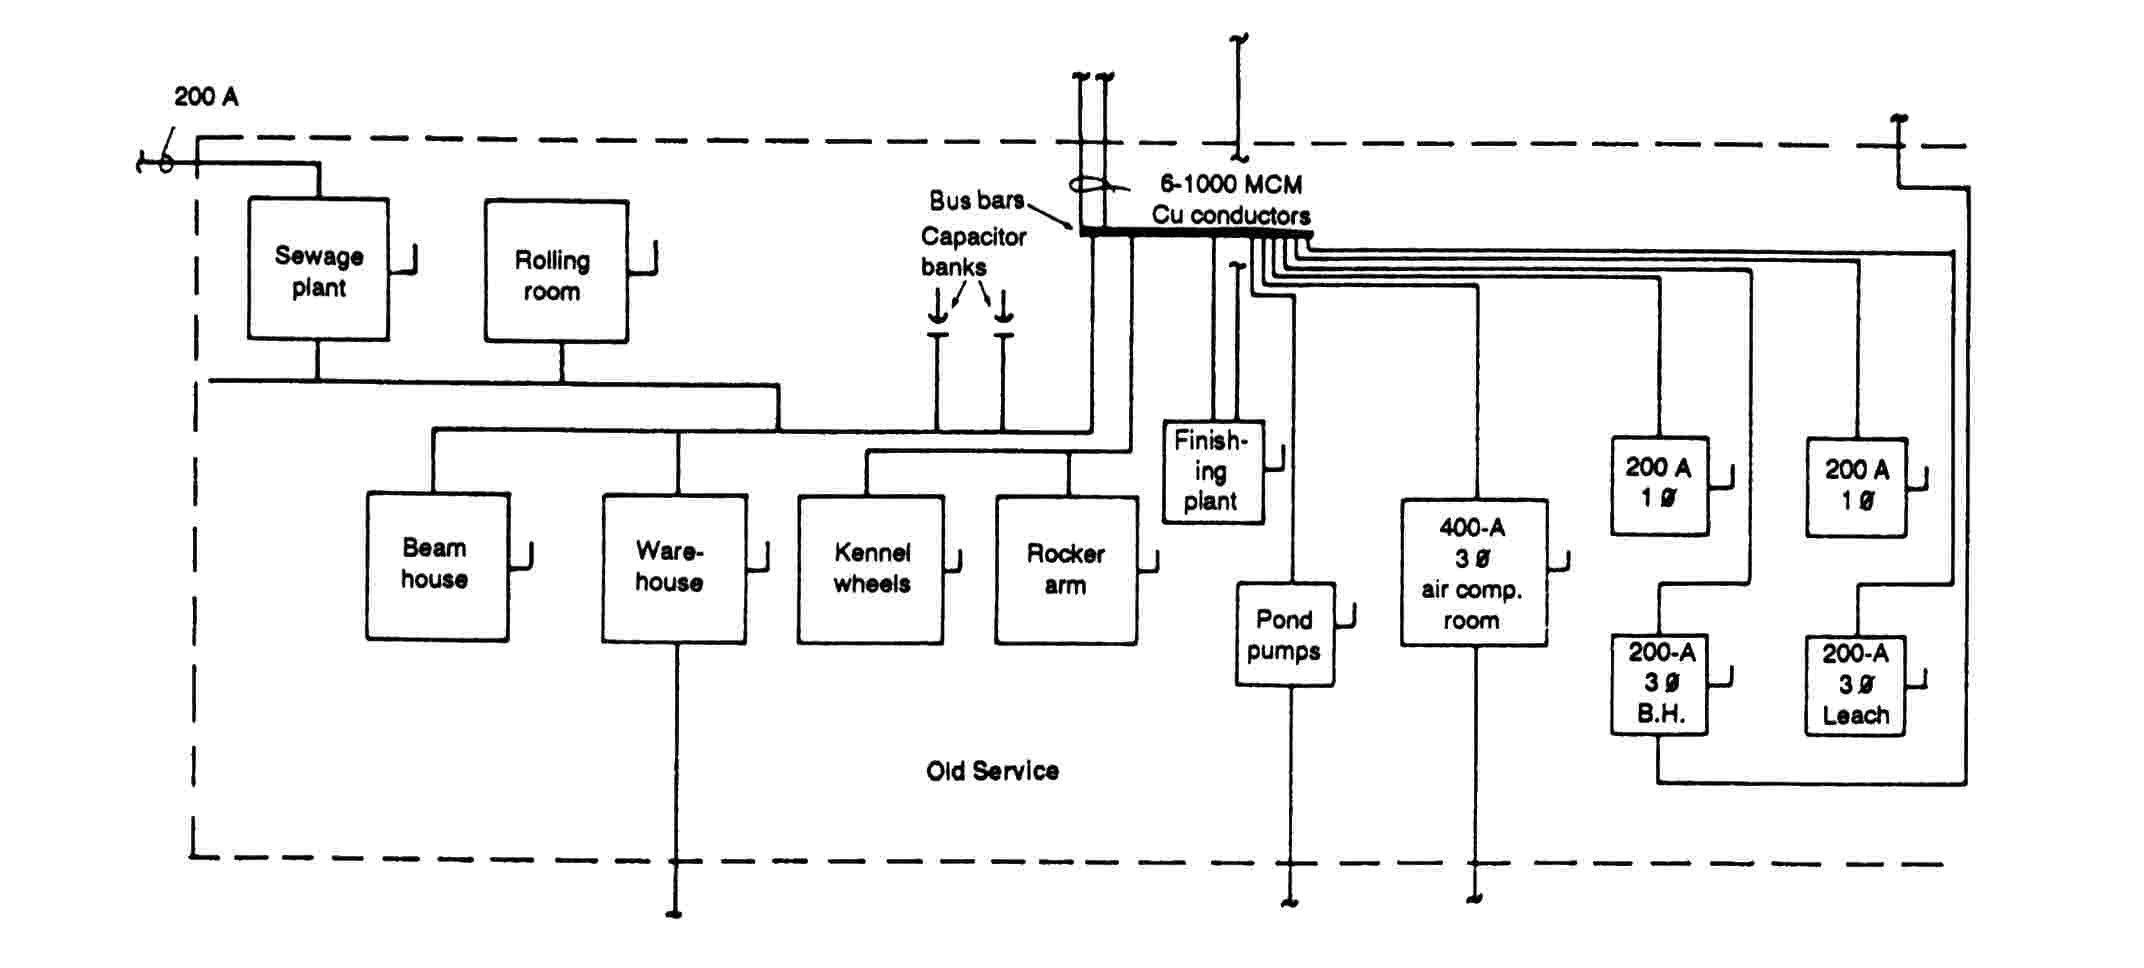 Wiring Diagram Of Building